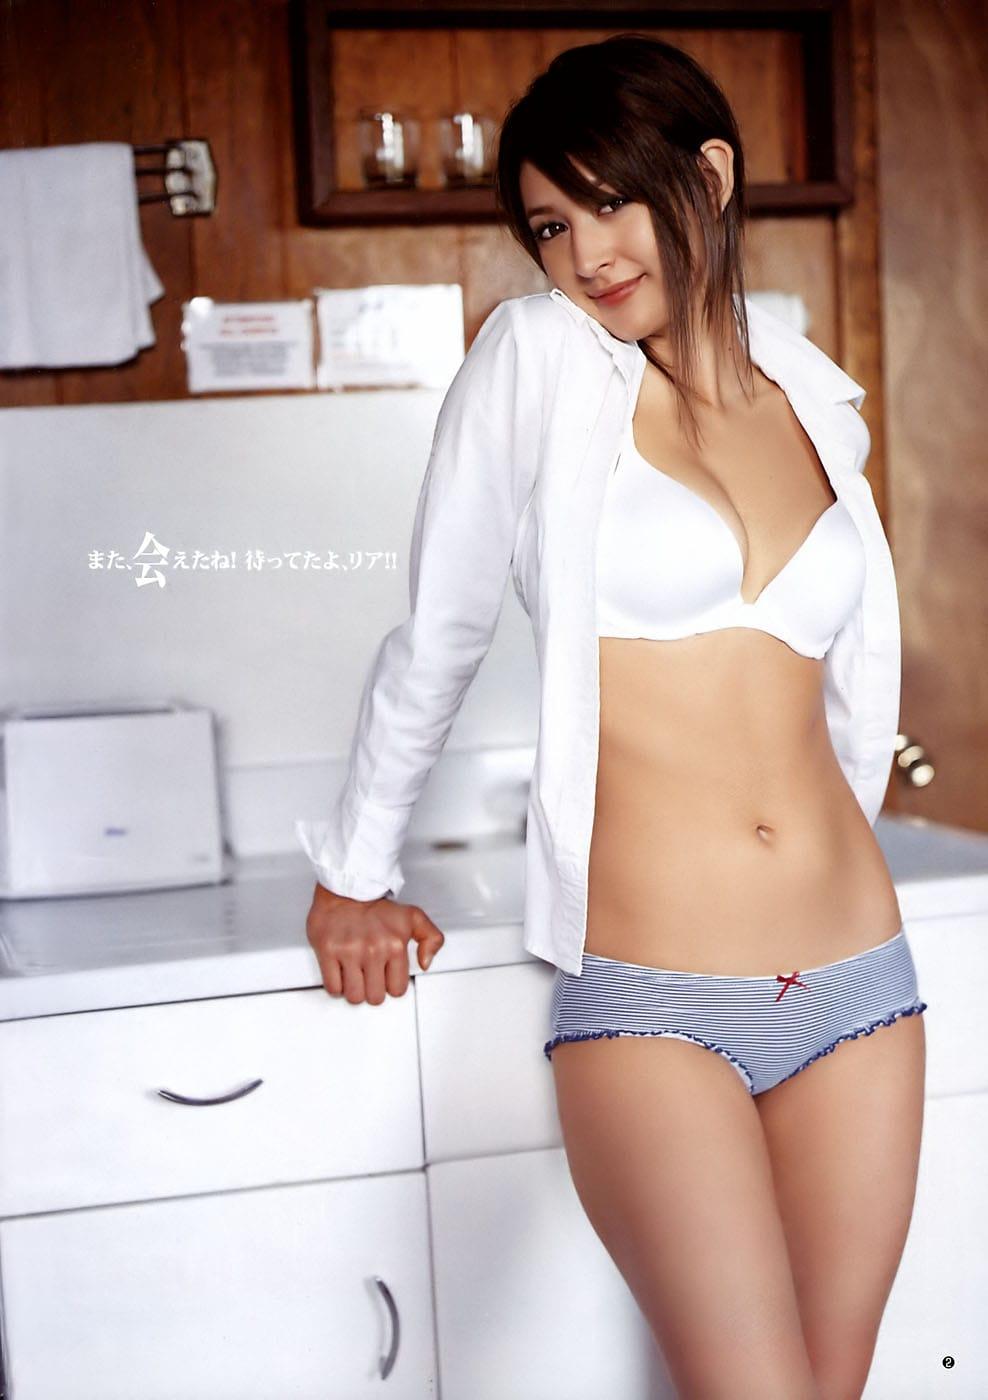 Nikki hilton sex videos